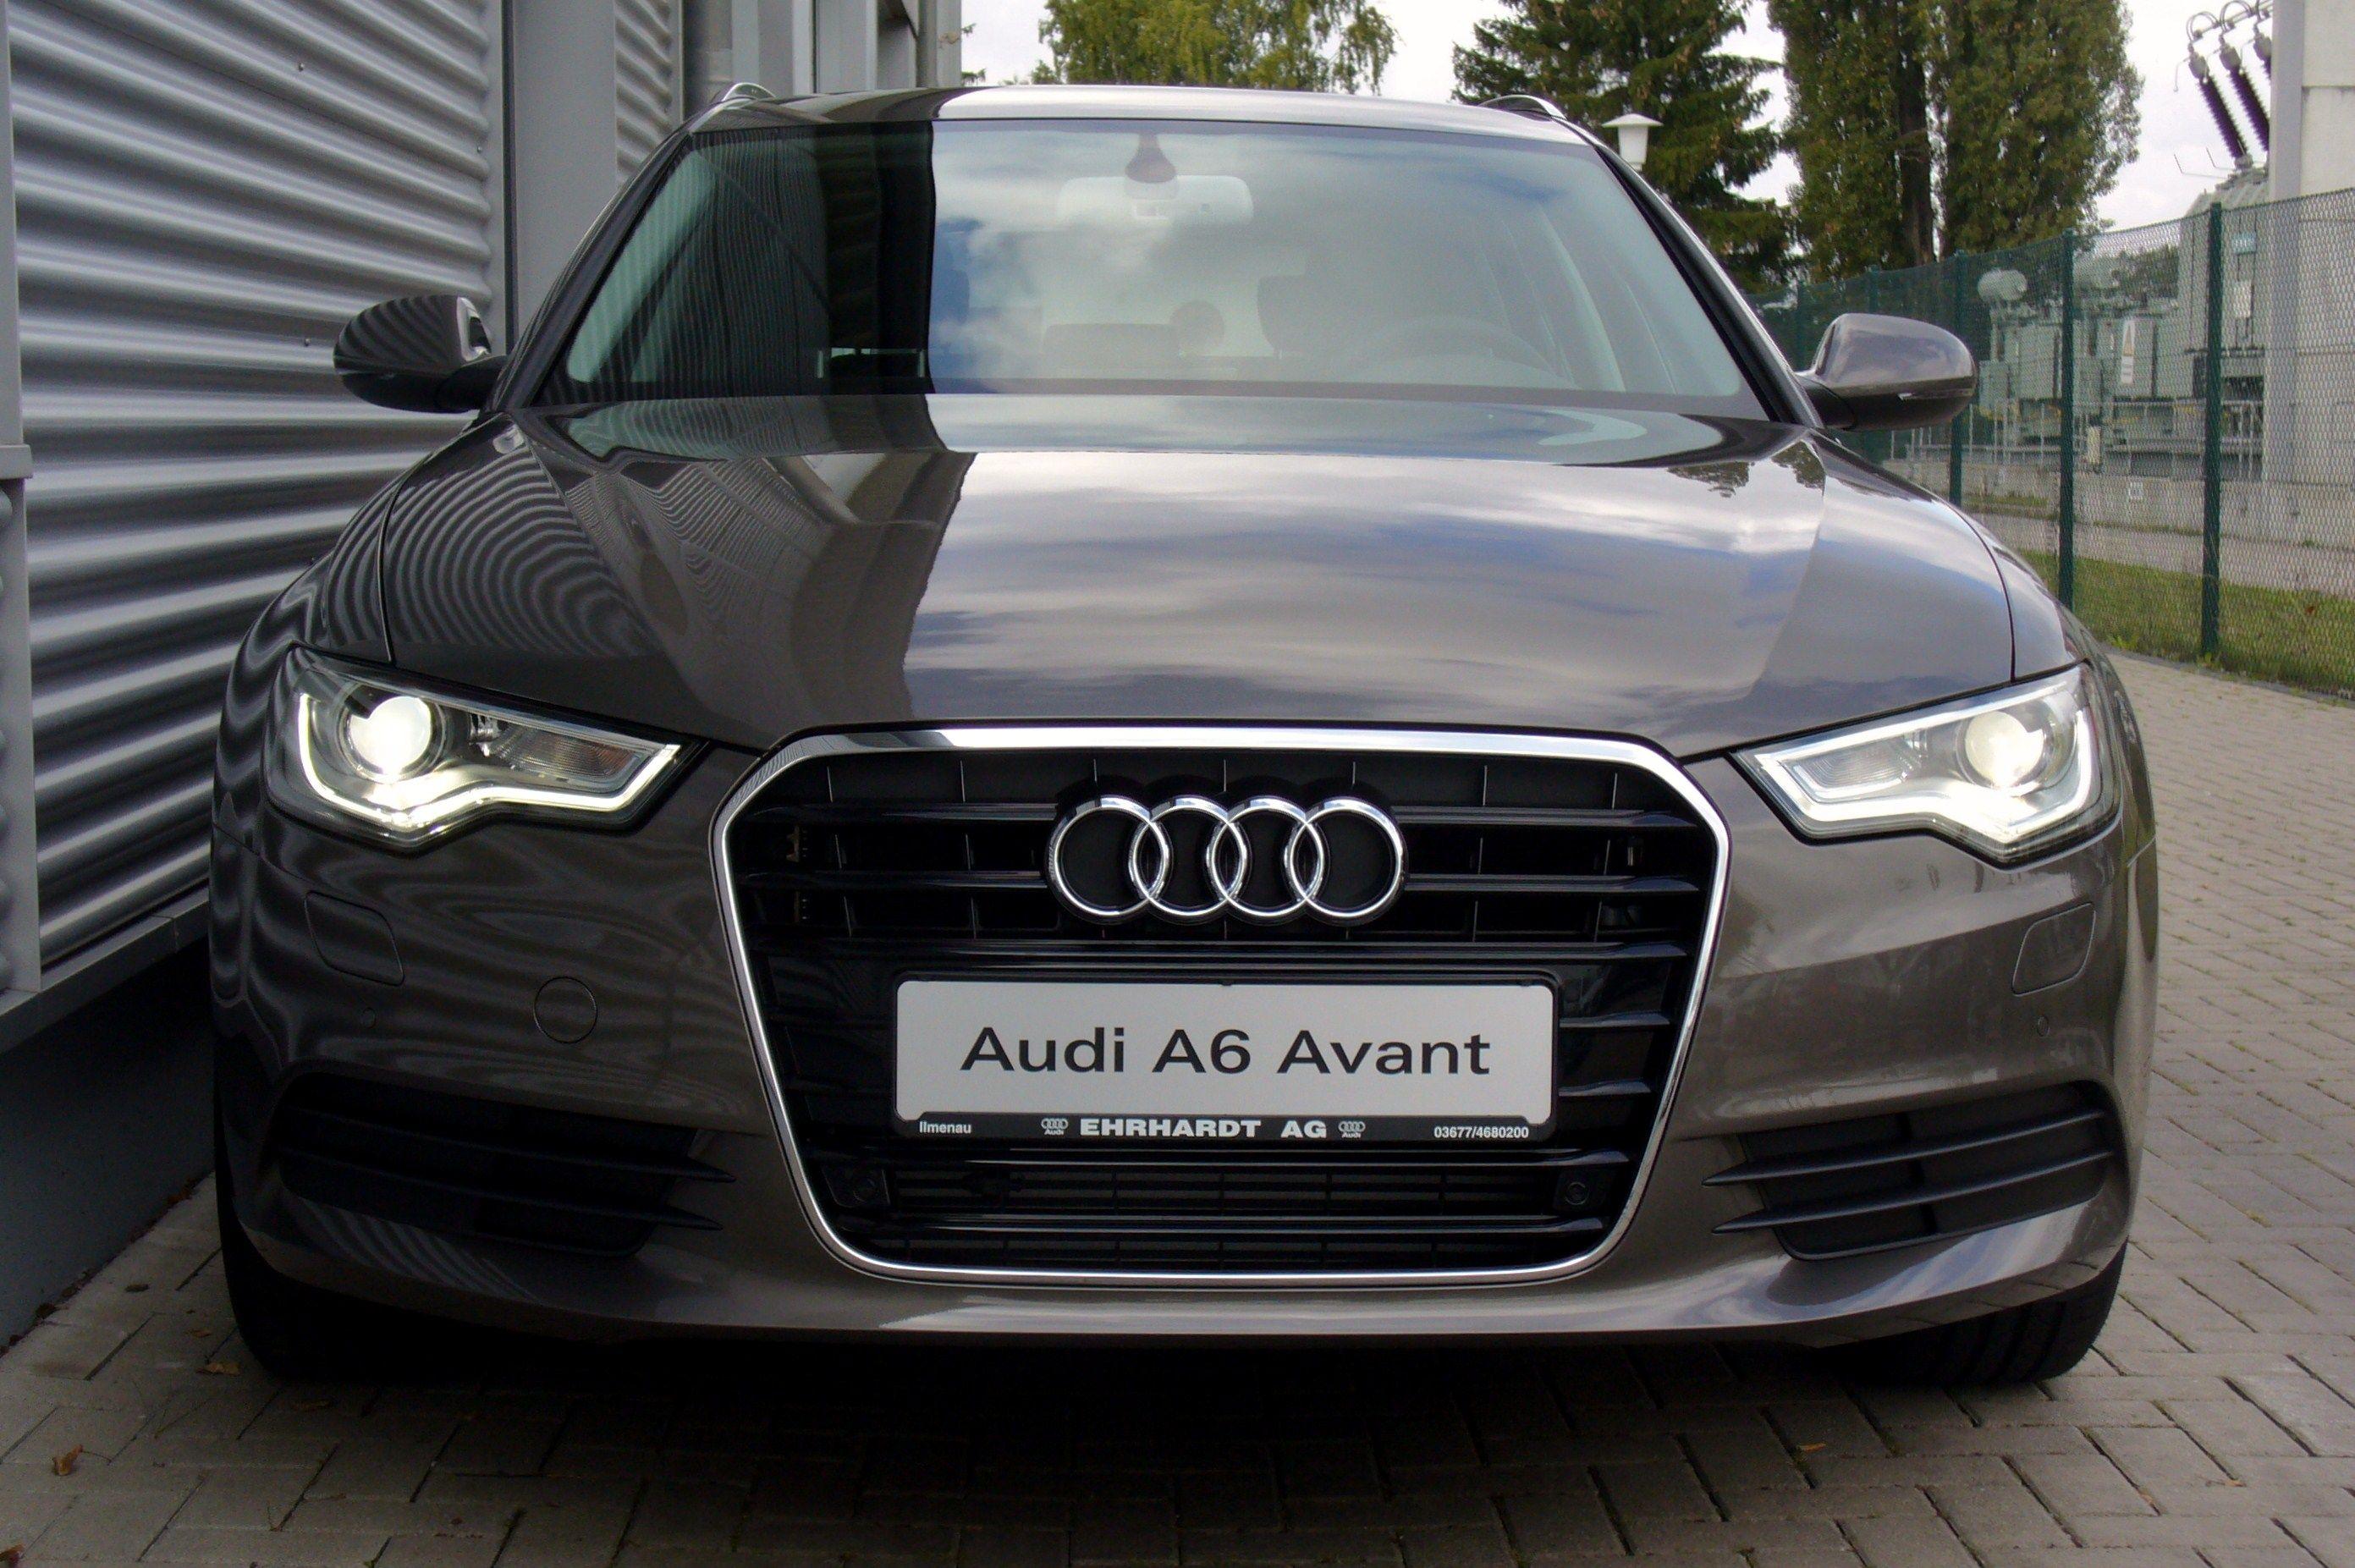 Audi A6 Avant 2 0 Tdi Hd Wallpaper Audi A6 Avant Audi A6 A6 Avant